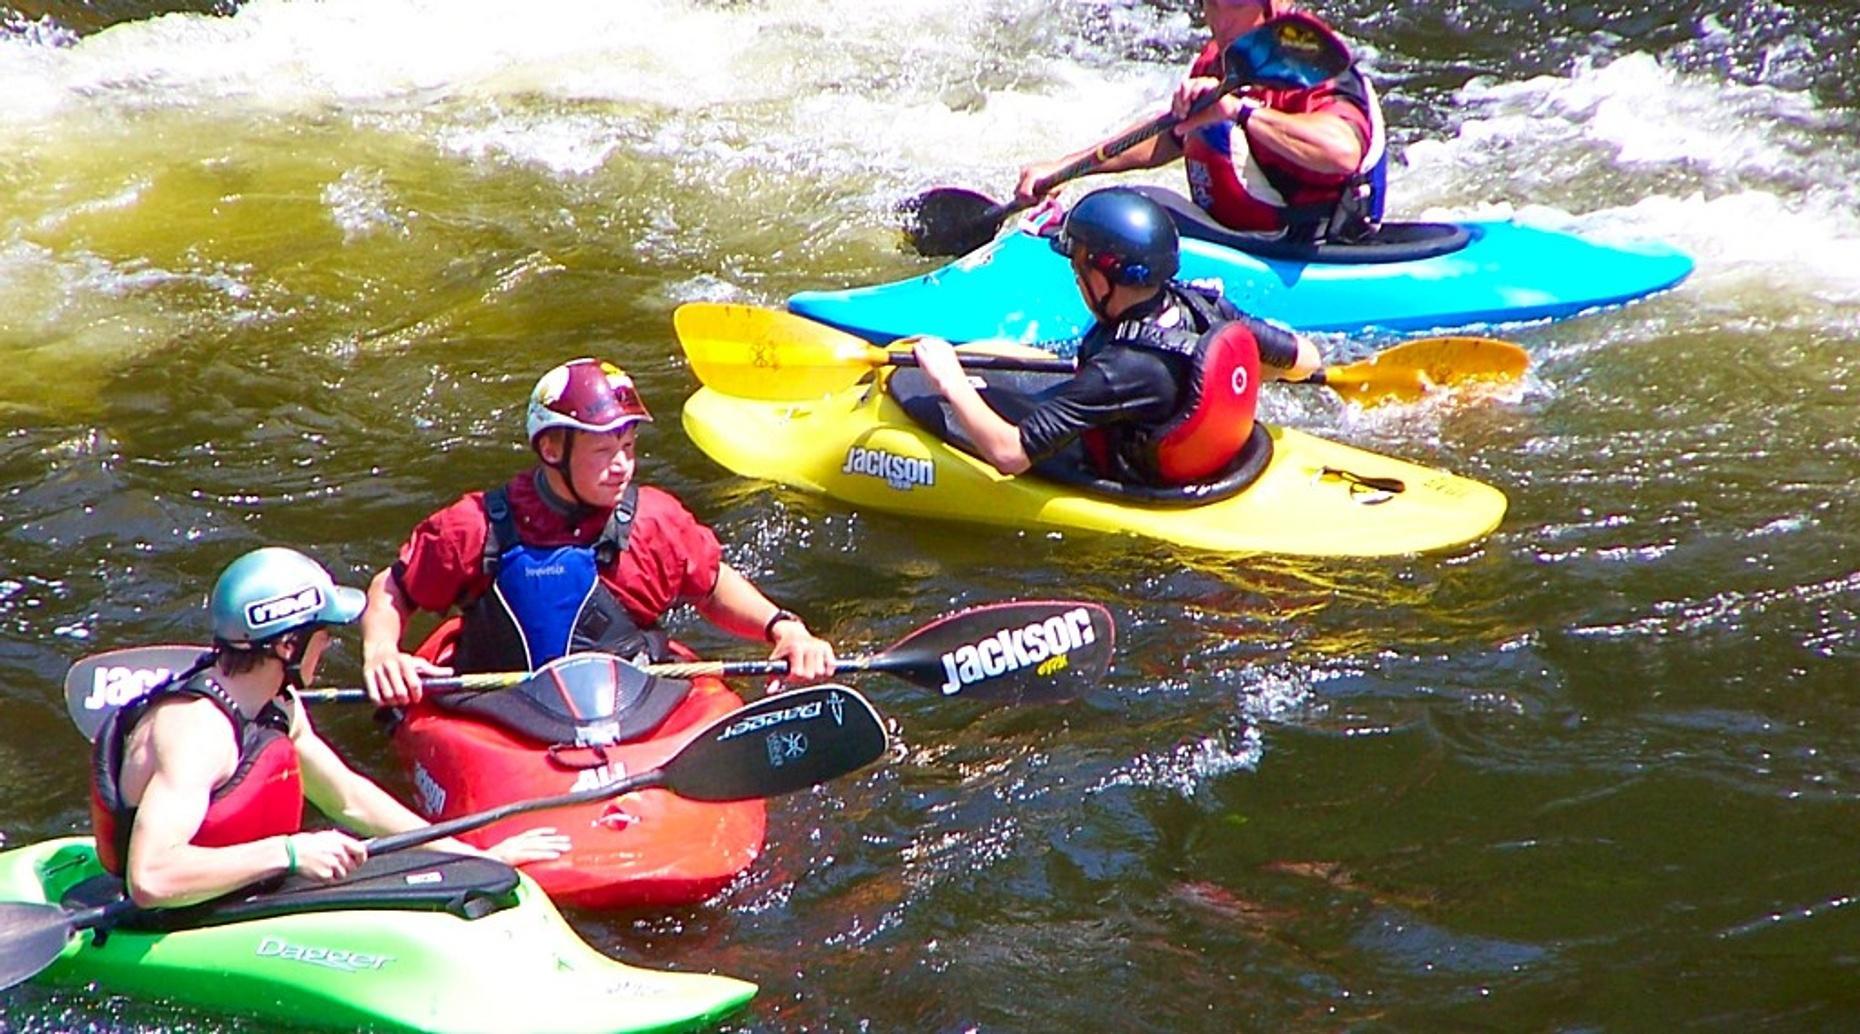 Private Group Kayak Tour and Rental